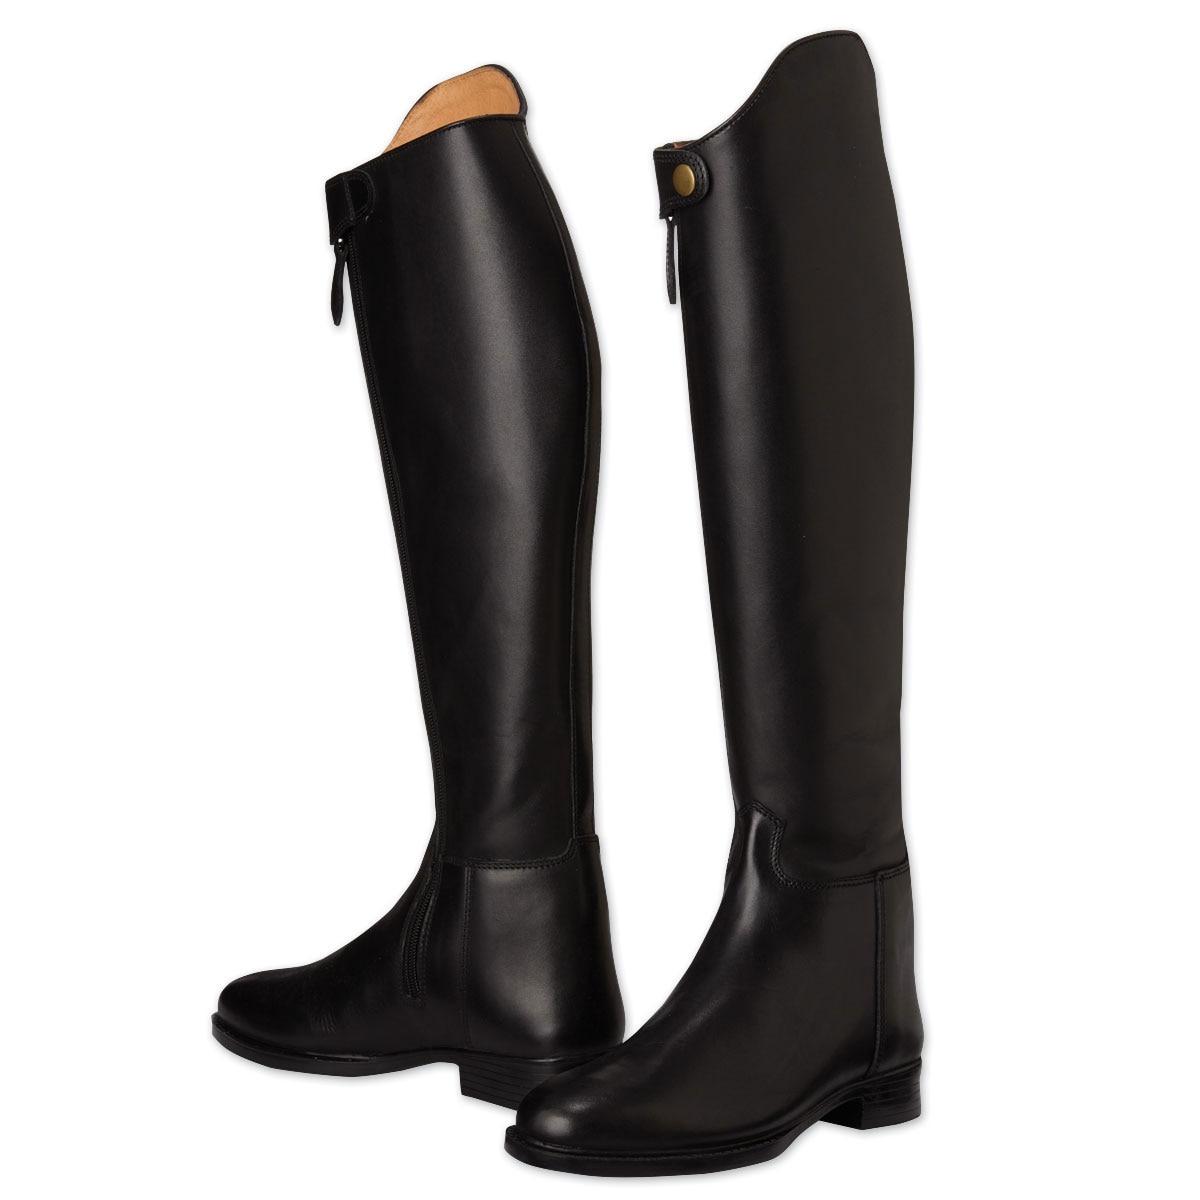 TuffRider Piaffe Dressage Tall Boot